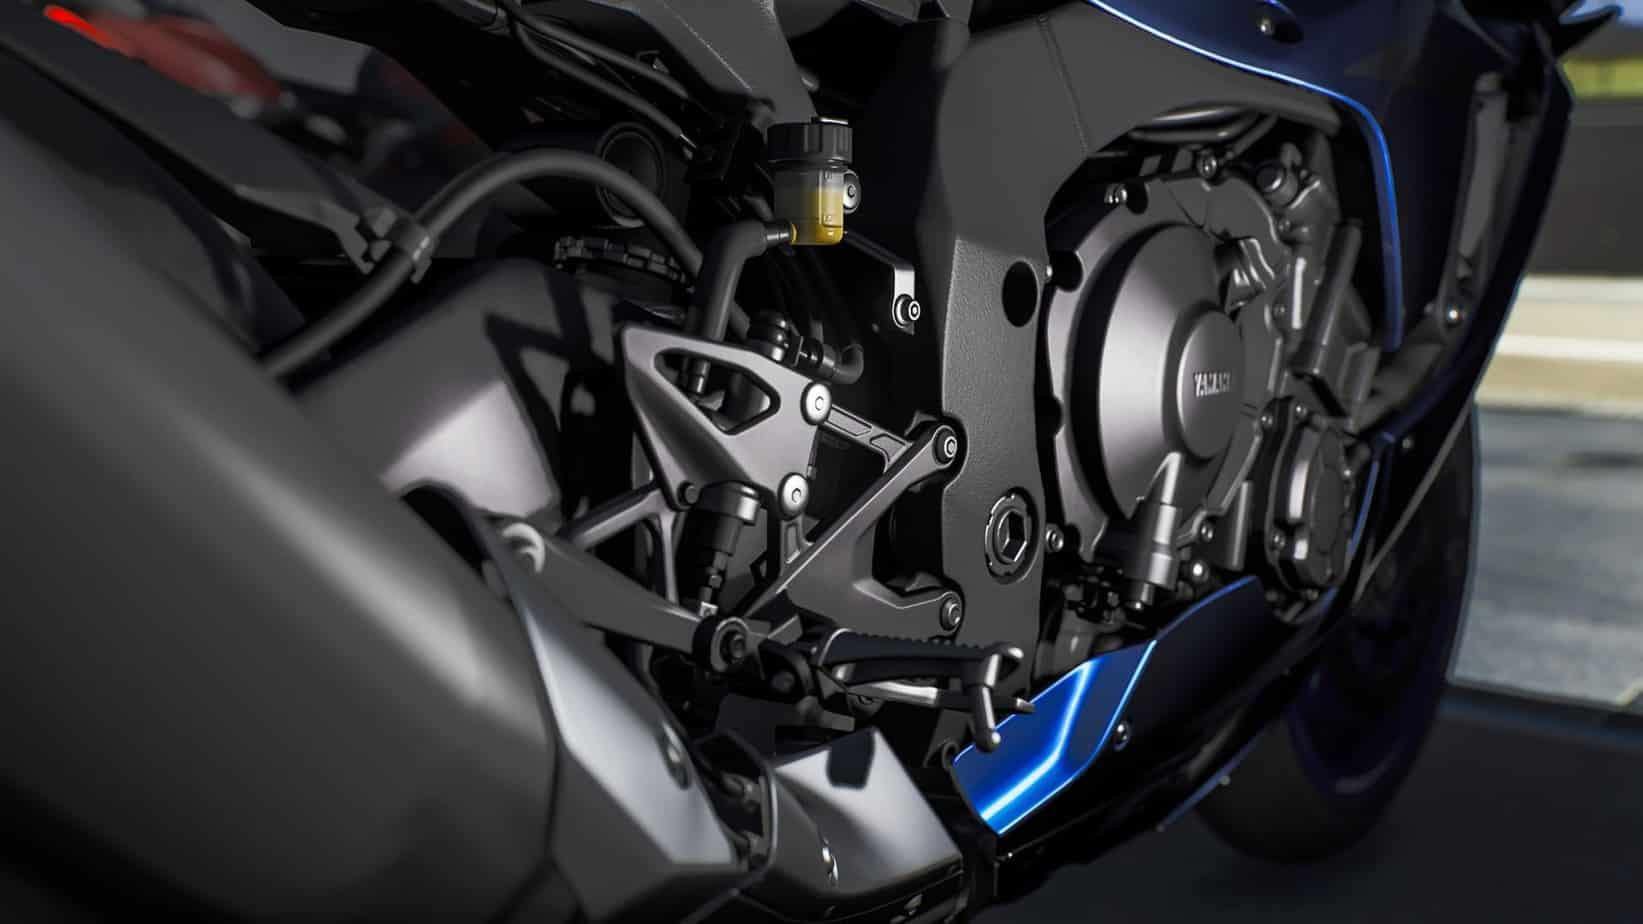 RIDE 4 кастомизация мотоциклов